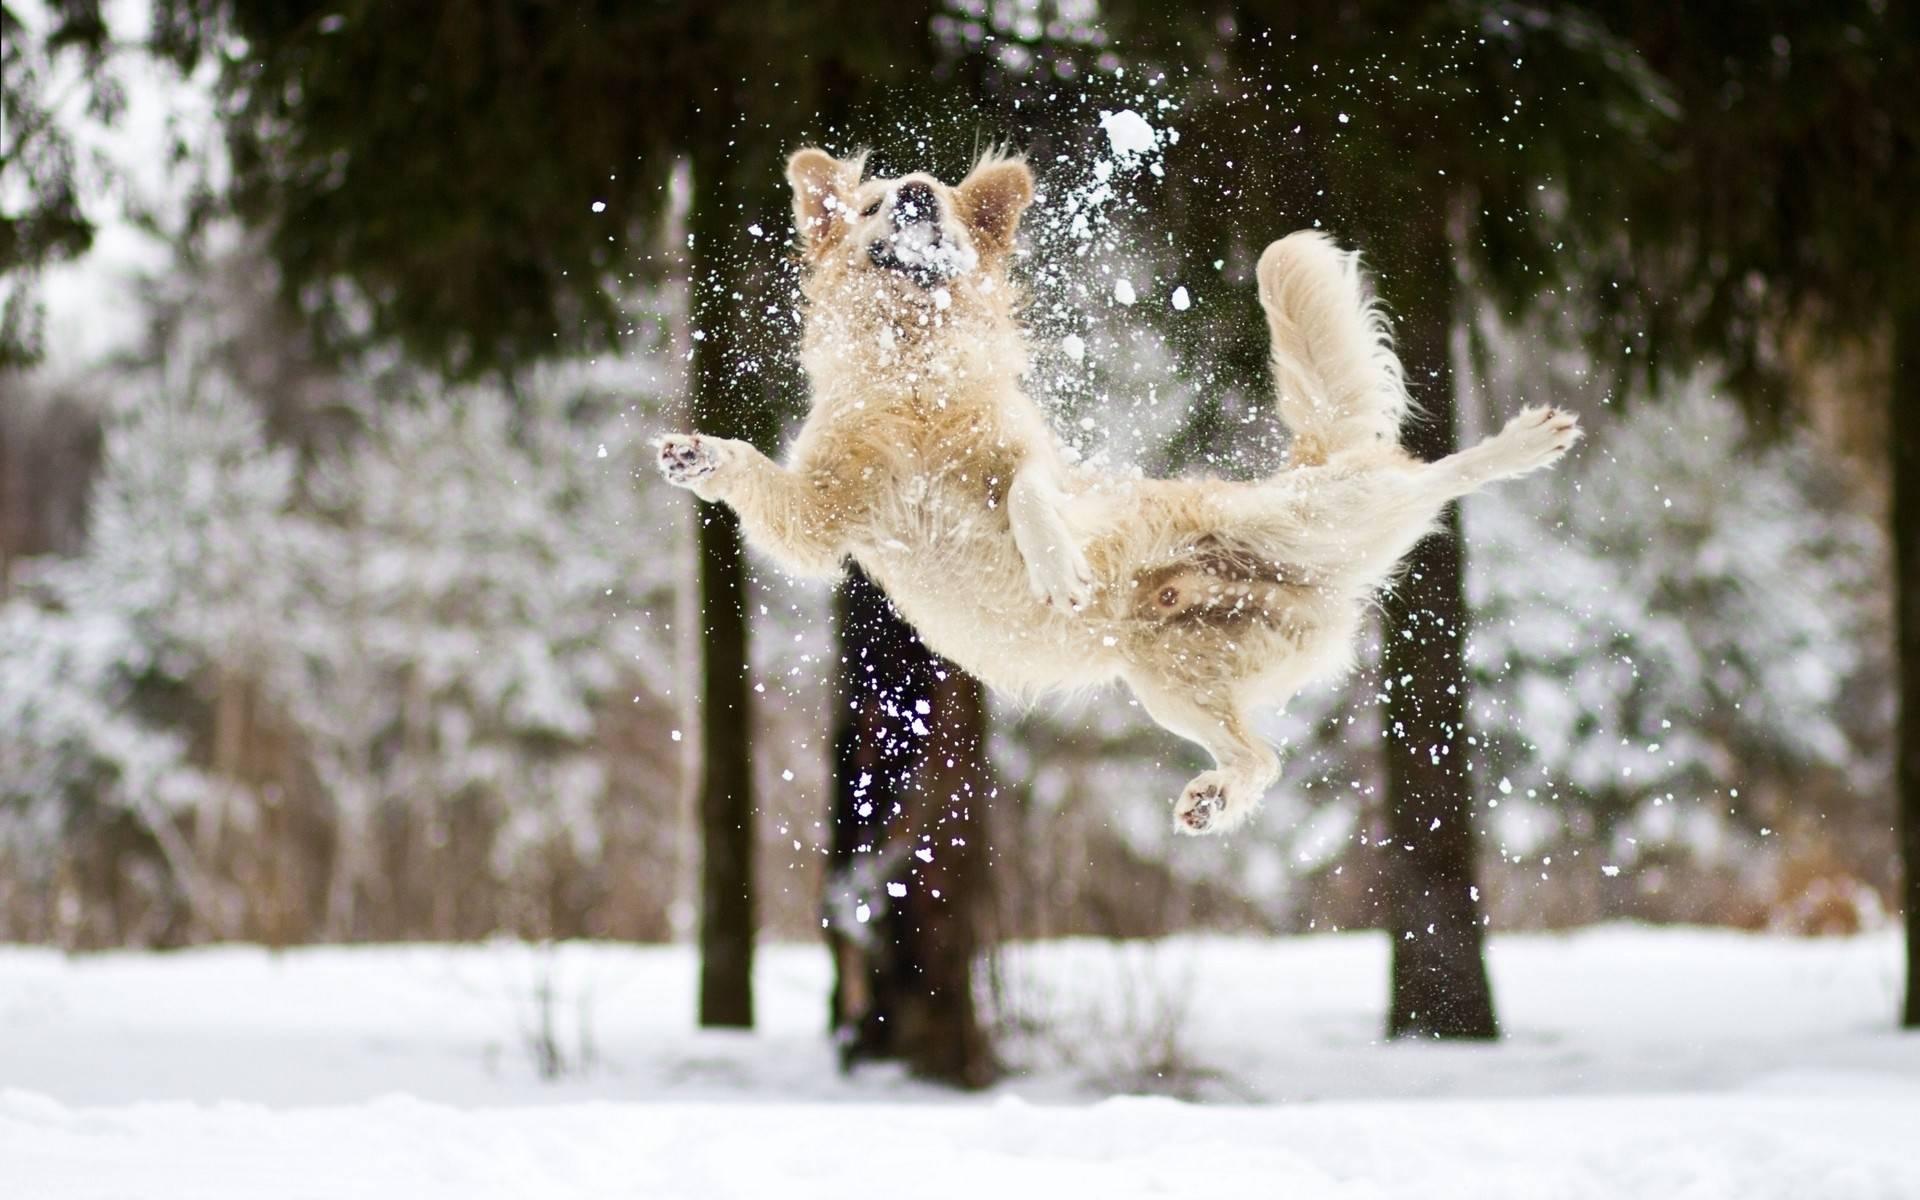 [50+] Dogs in the Snow Wallpaper on WallpaperSafari